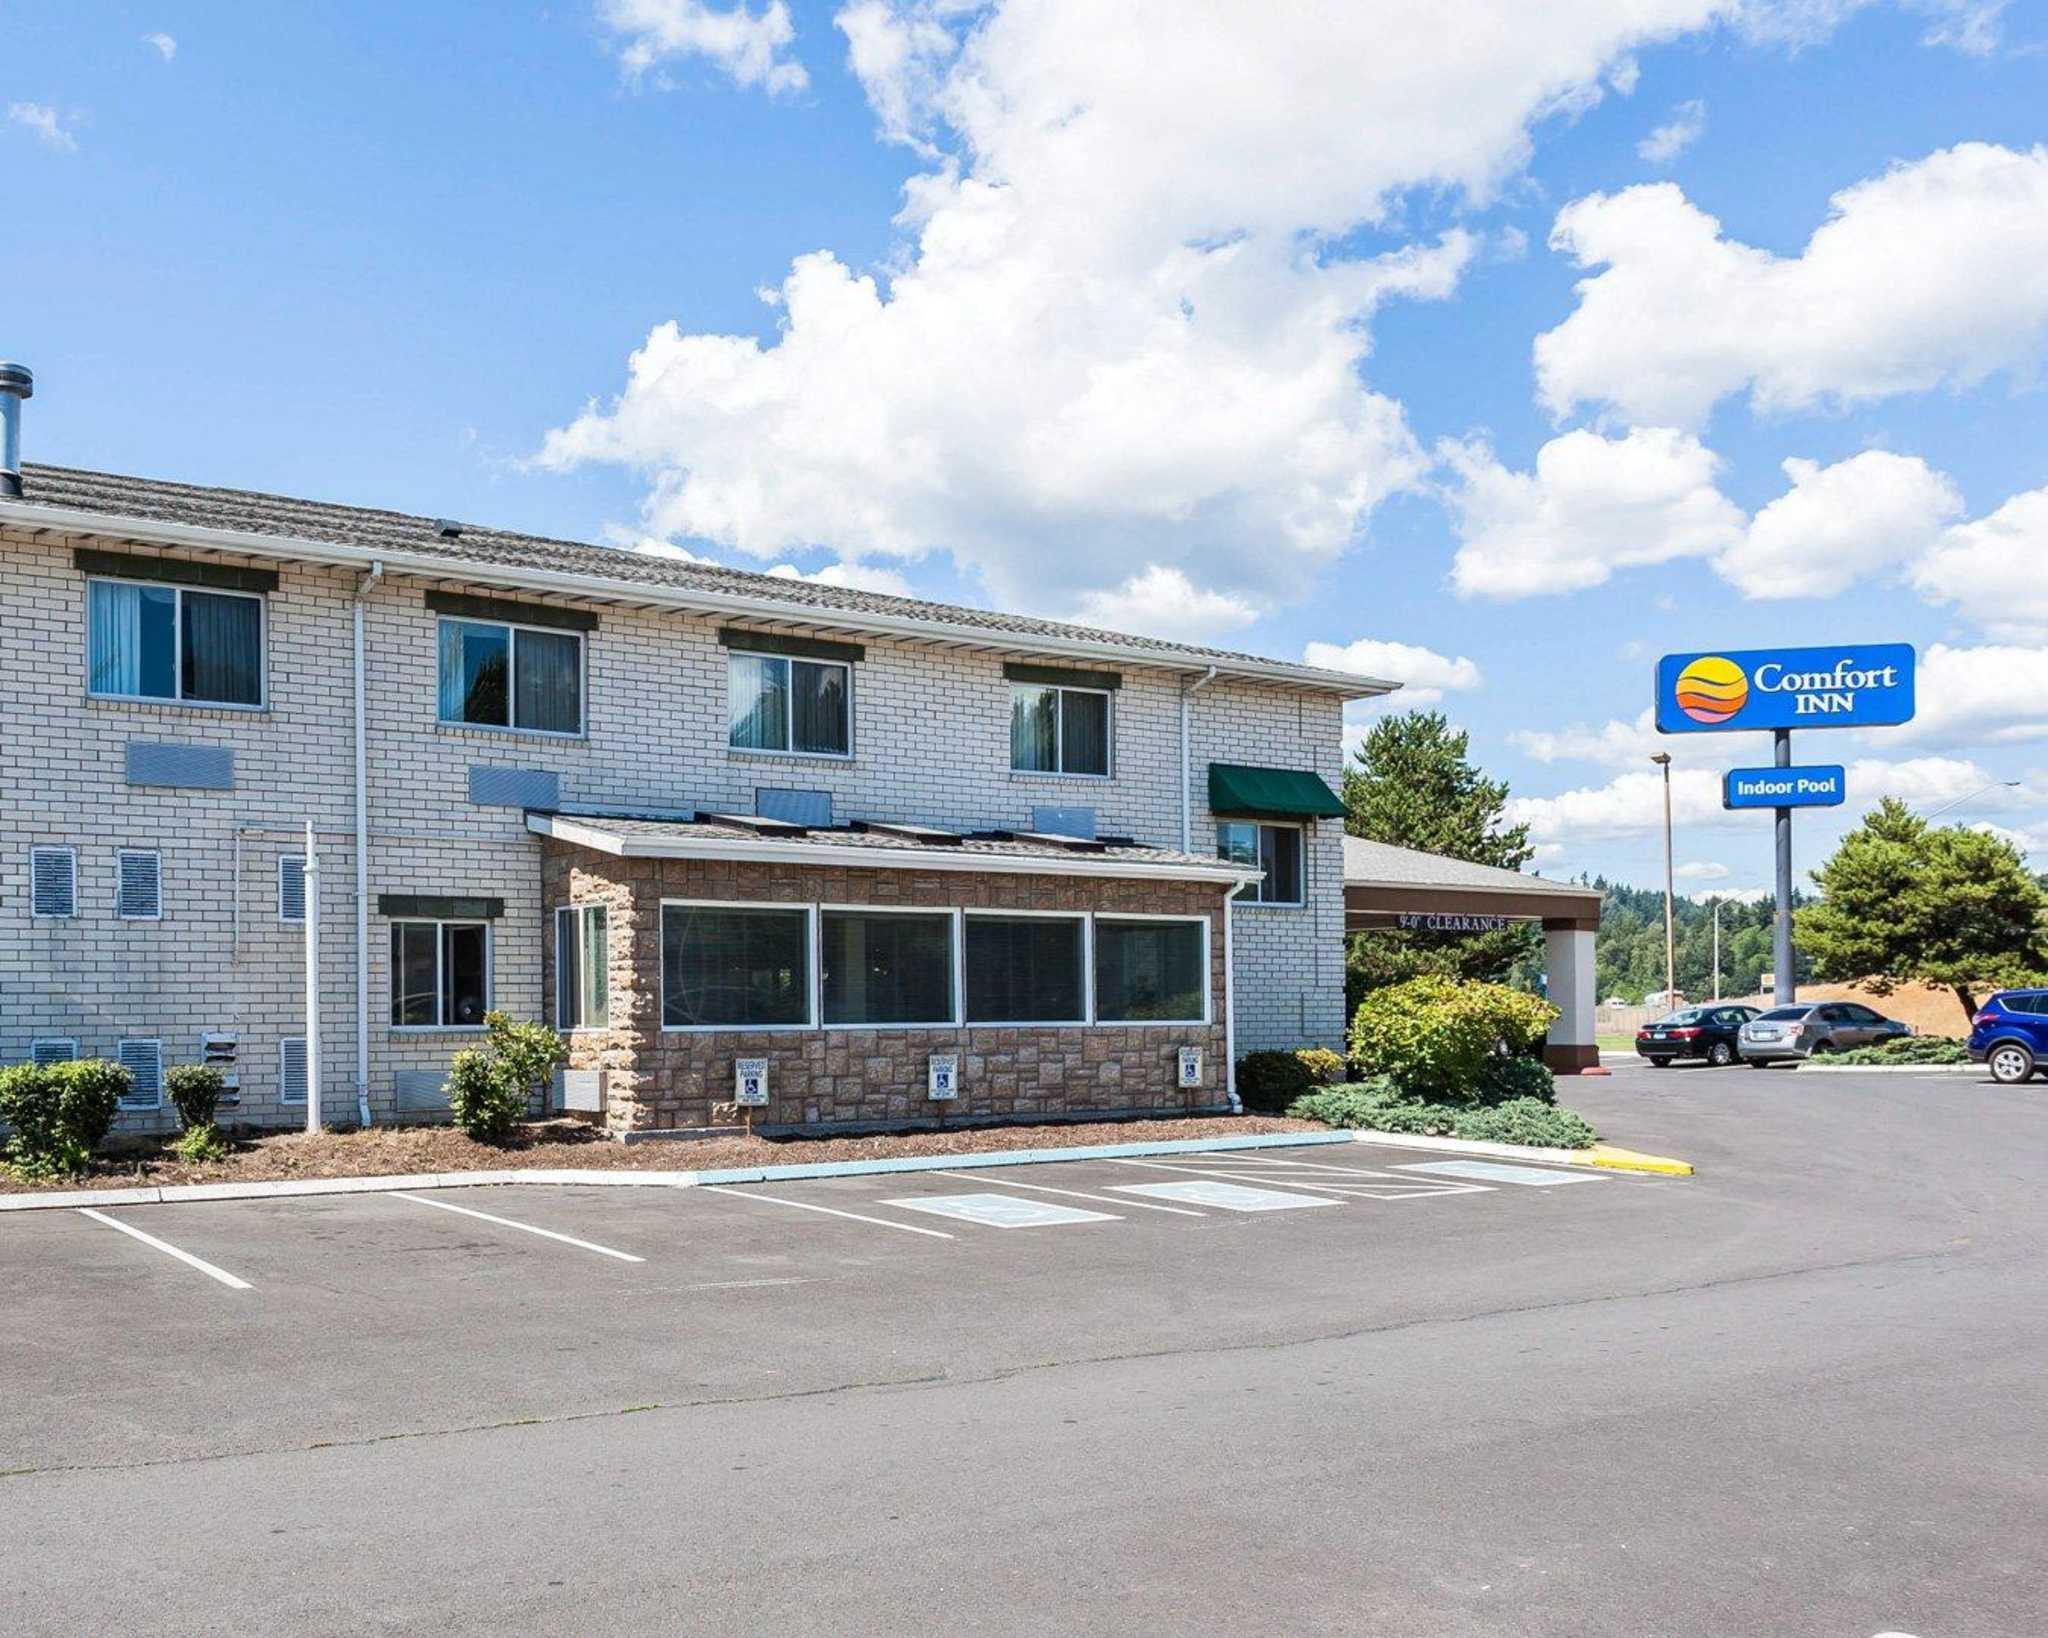 Comfort Inn Kelso - Longview image 2